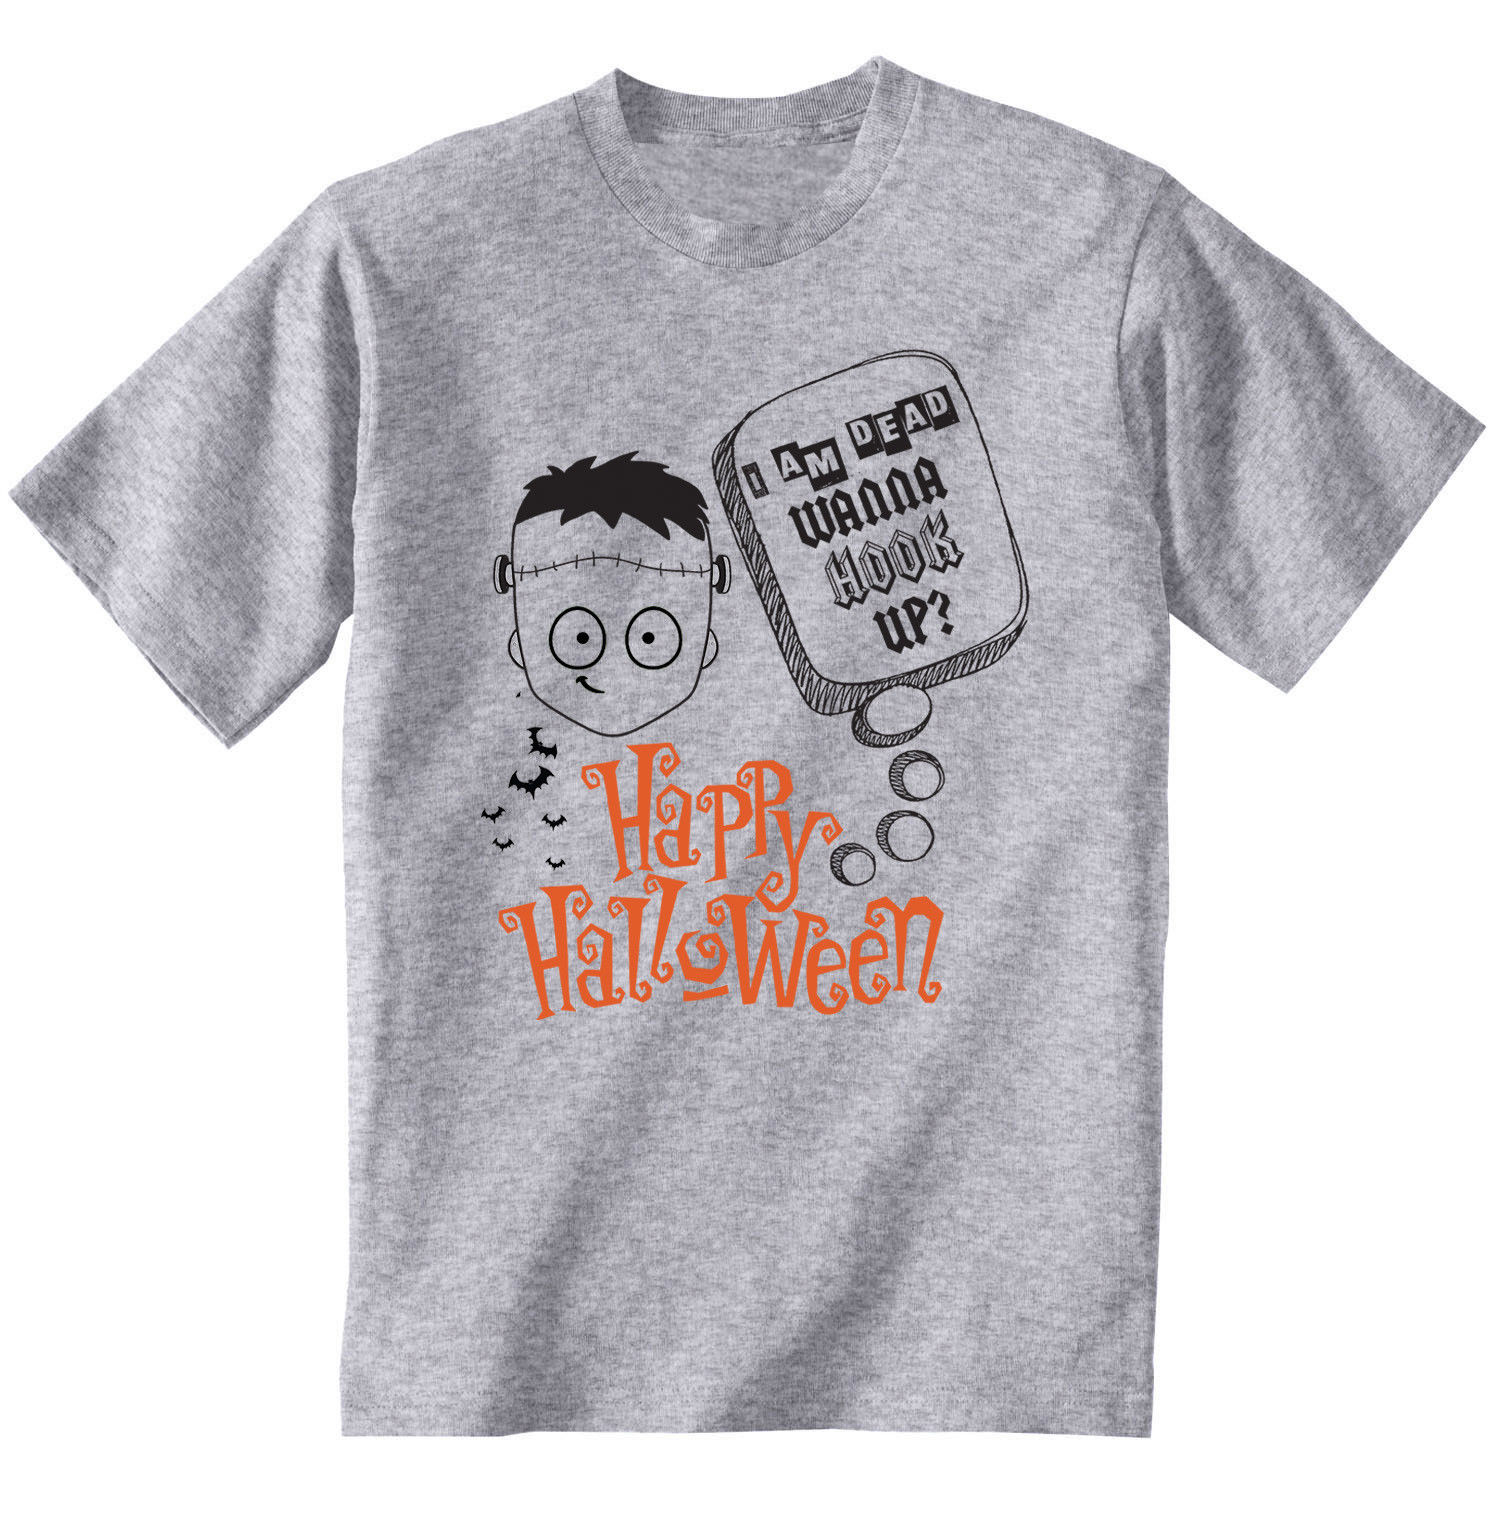 Happy Halloween Wanna Hook Up divertida manga corta o-cuello camisetas para hombres